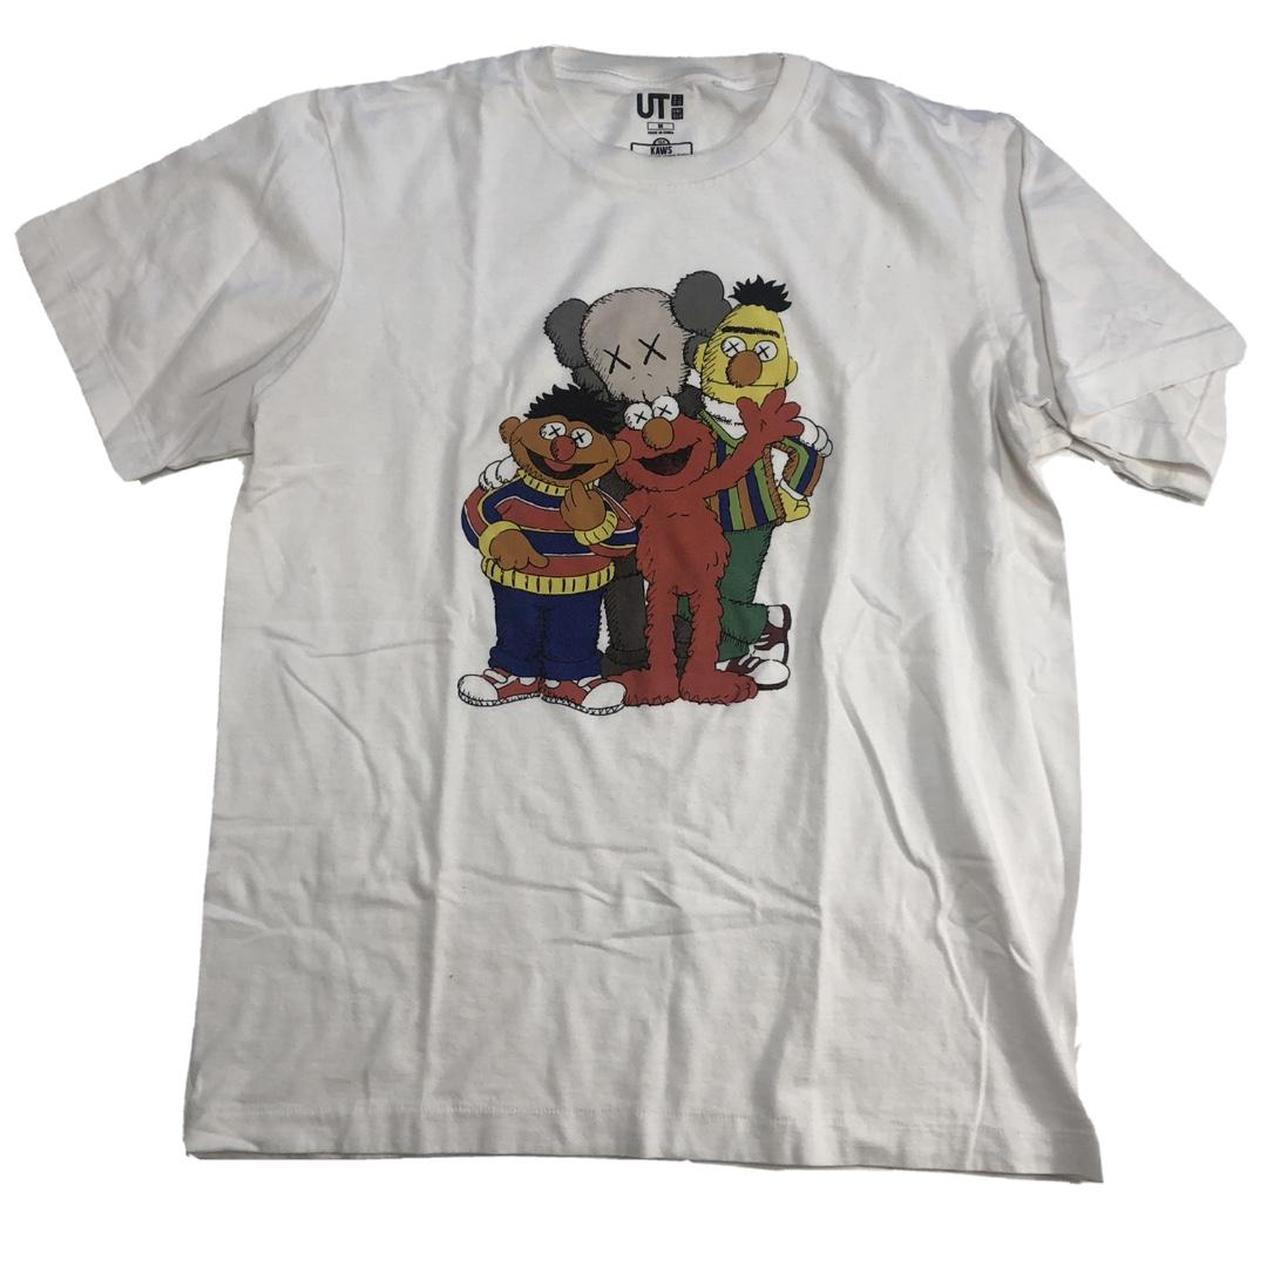 Product Image 1 - Kaws Sesame Street Uniqlo Shirt